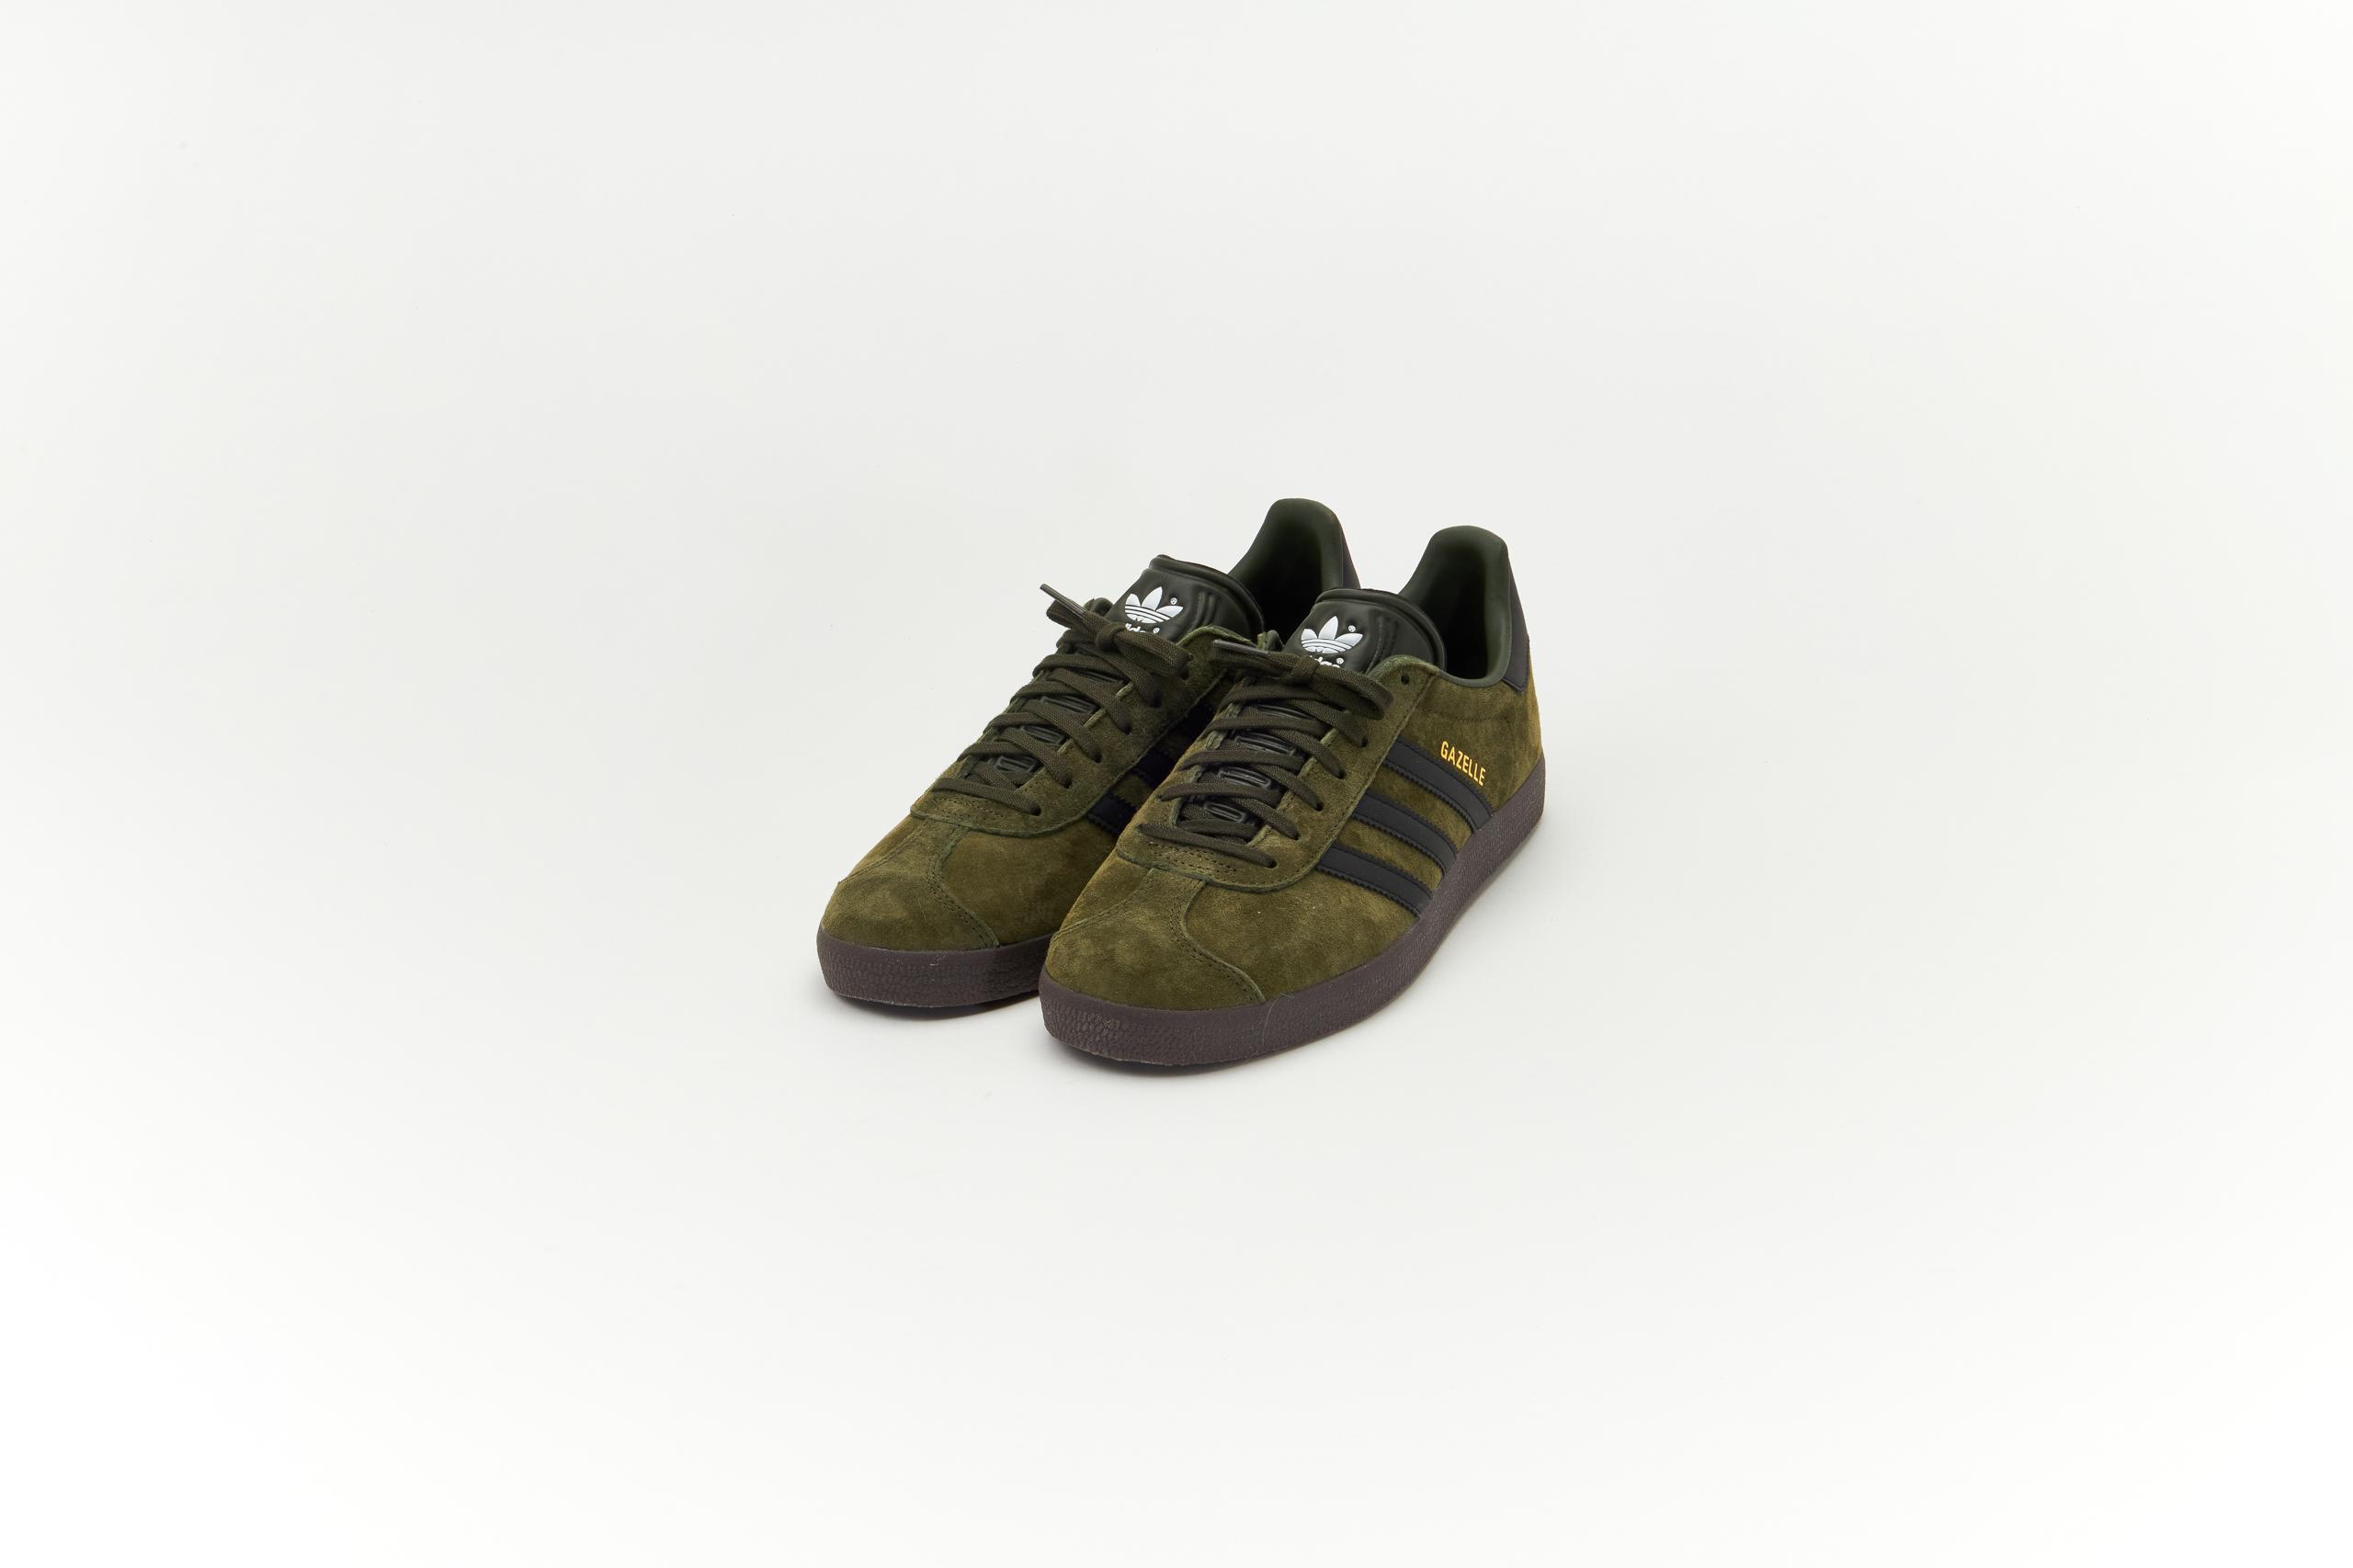 Adidas Gazelle Night Cargo/Core Black-Gum5